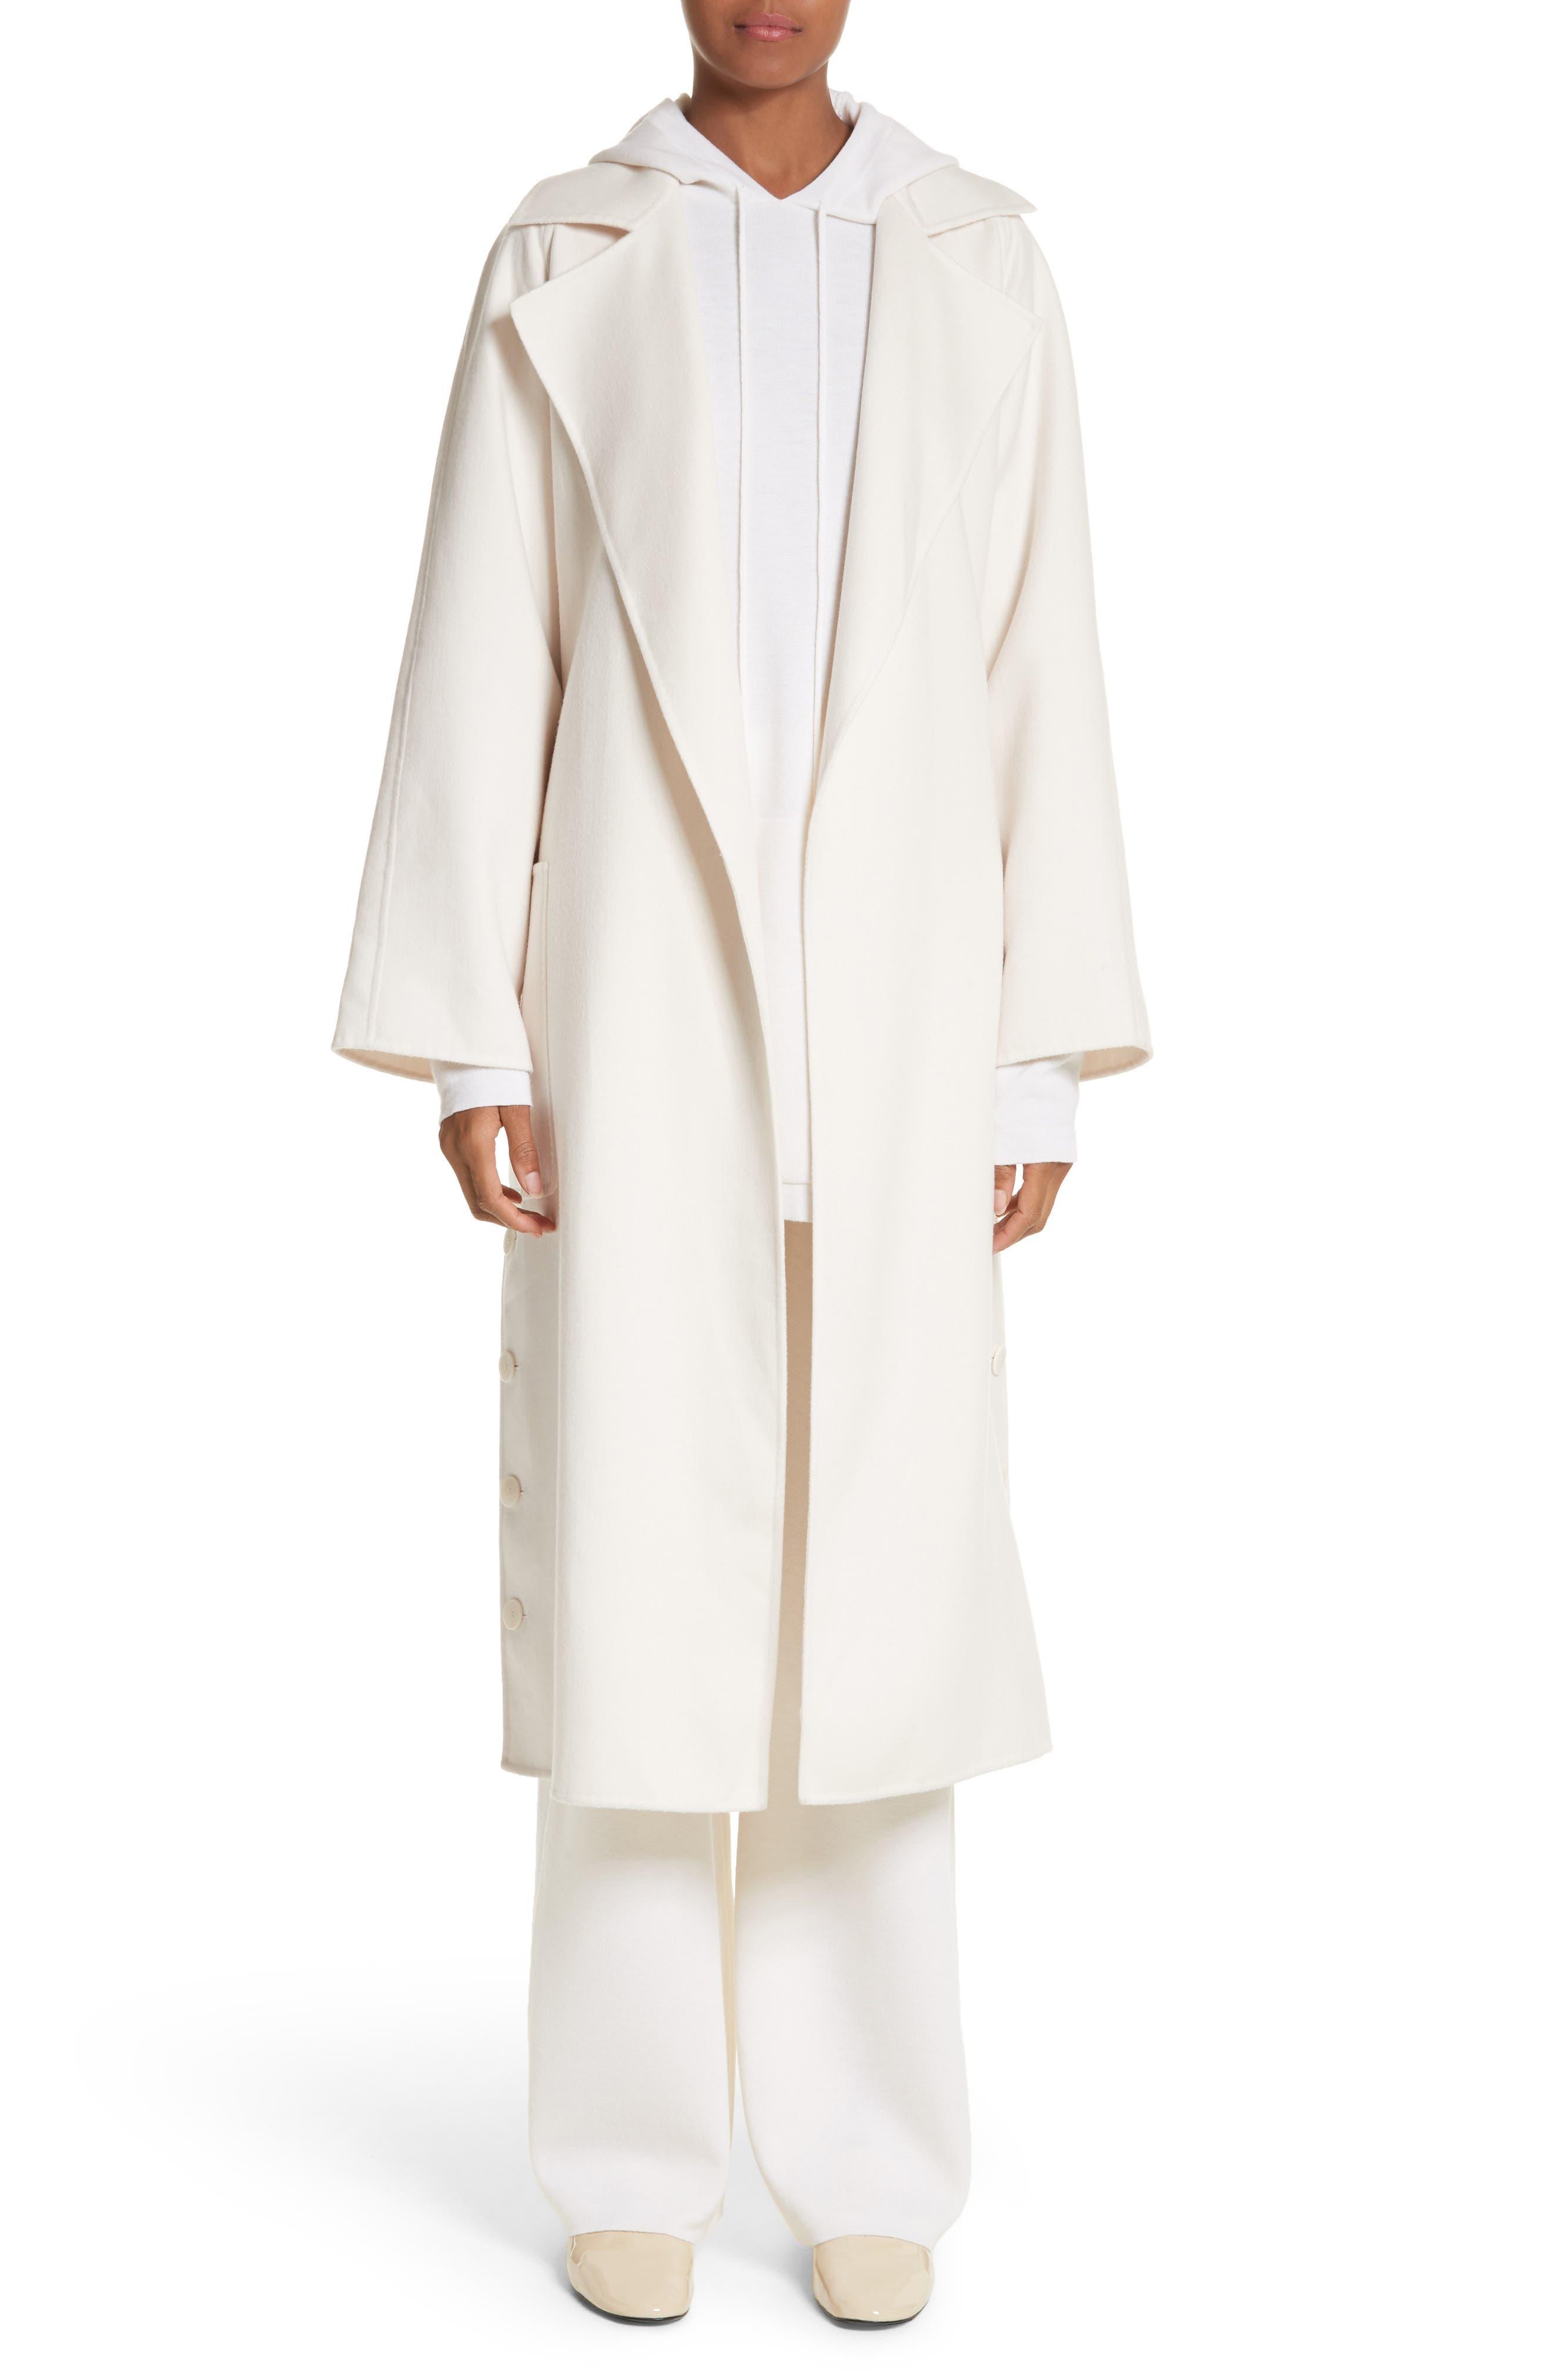 Alacre Wool & Cashmere Coat,                         Main,                         color, 110